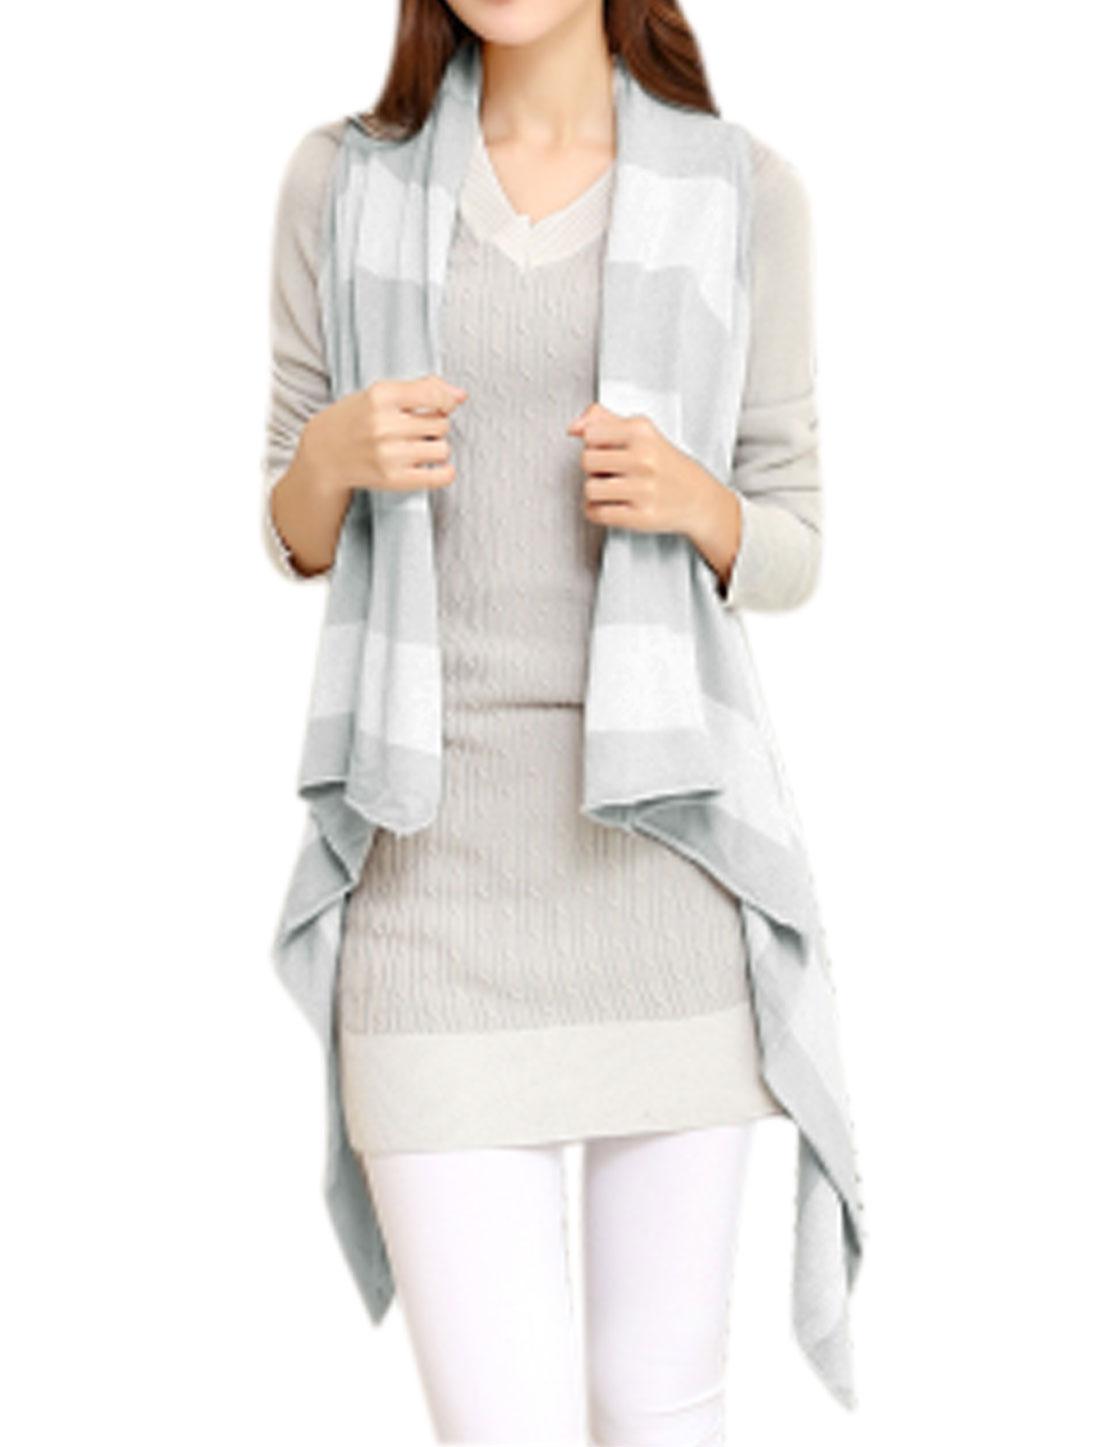 Lady Asymmetrical Hem Cardigan Knitting Vest Light Grey XS